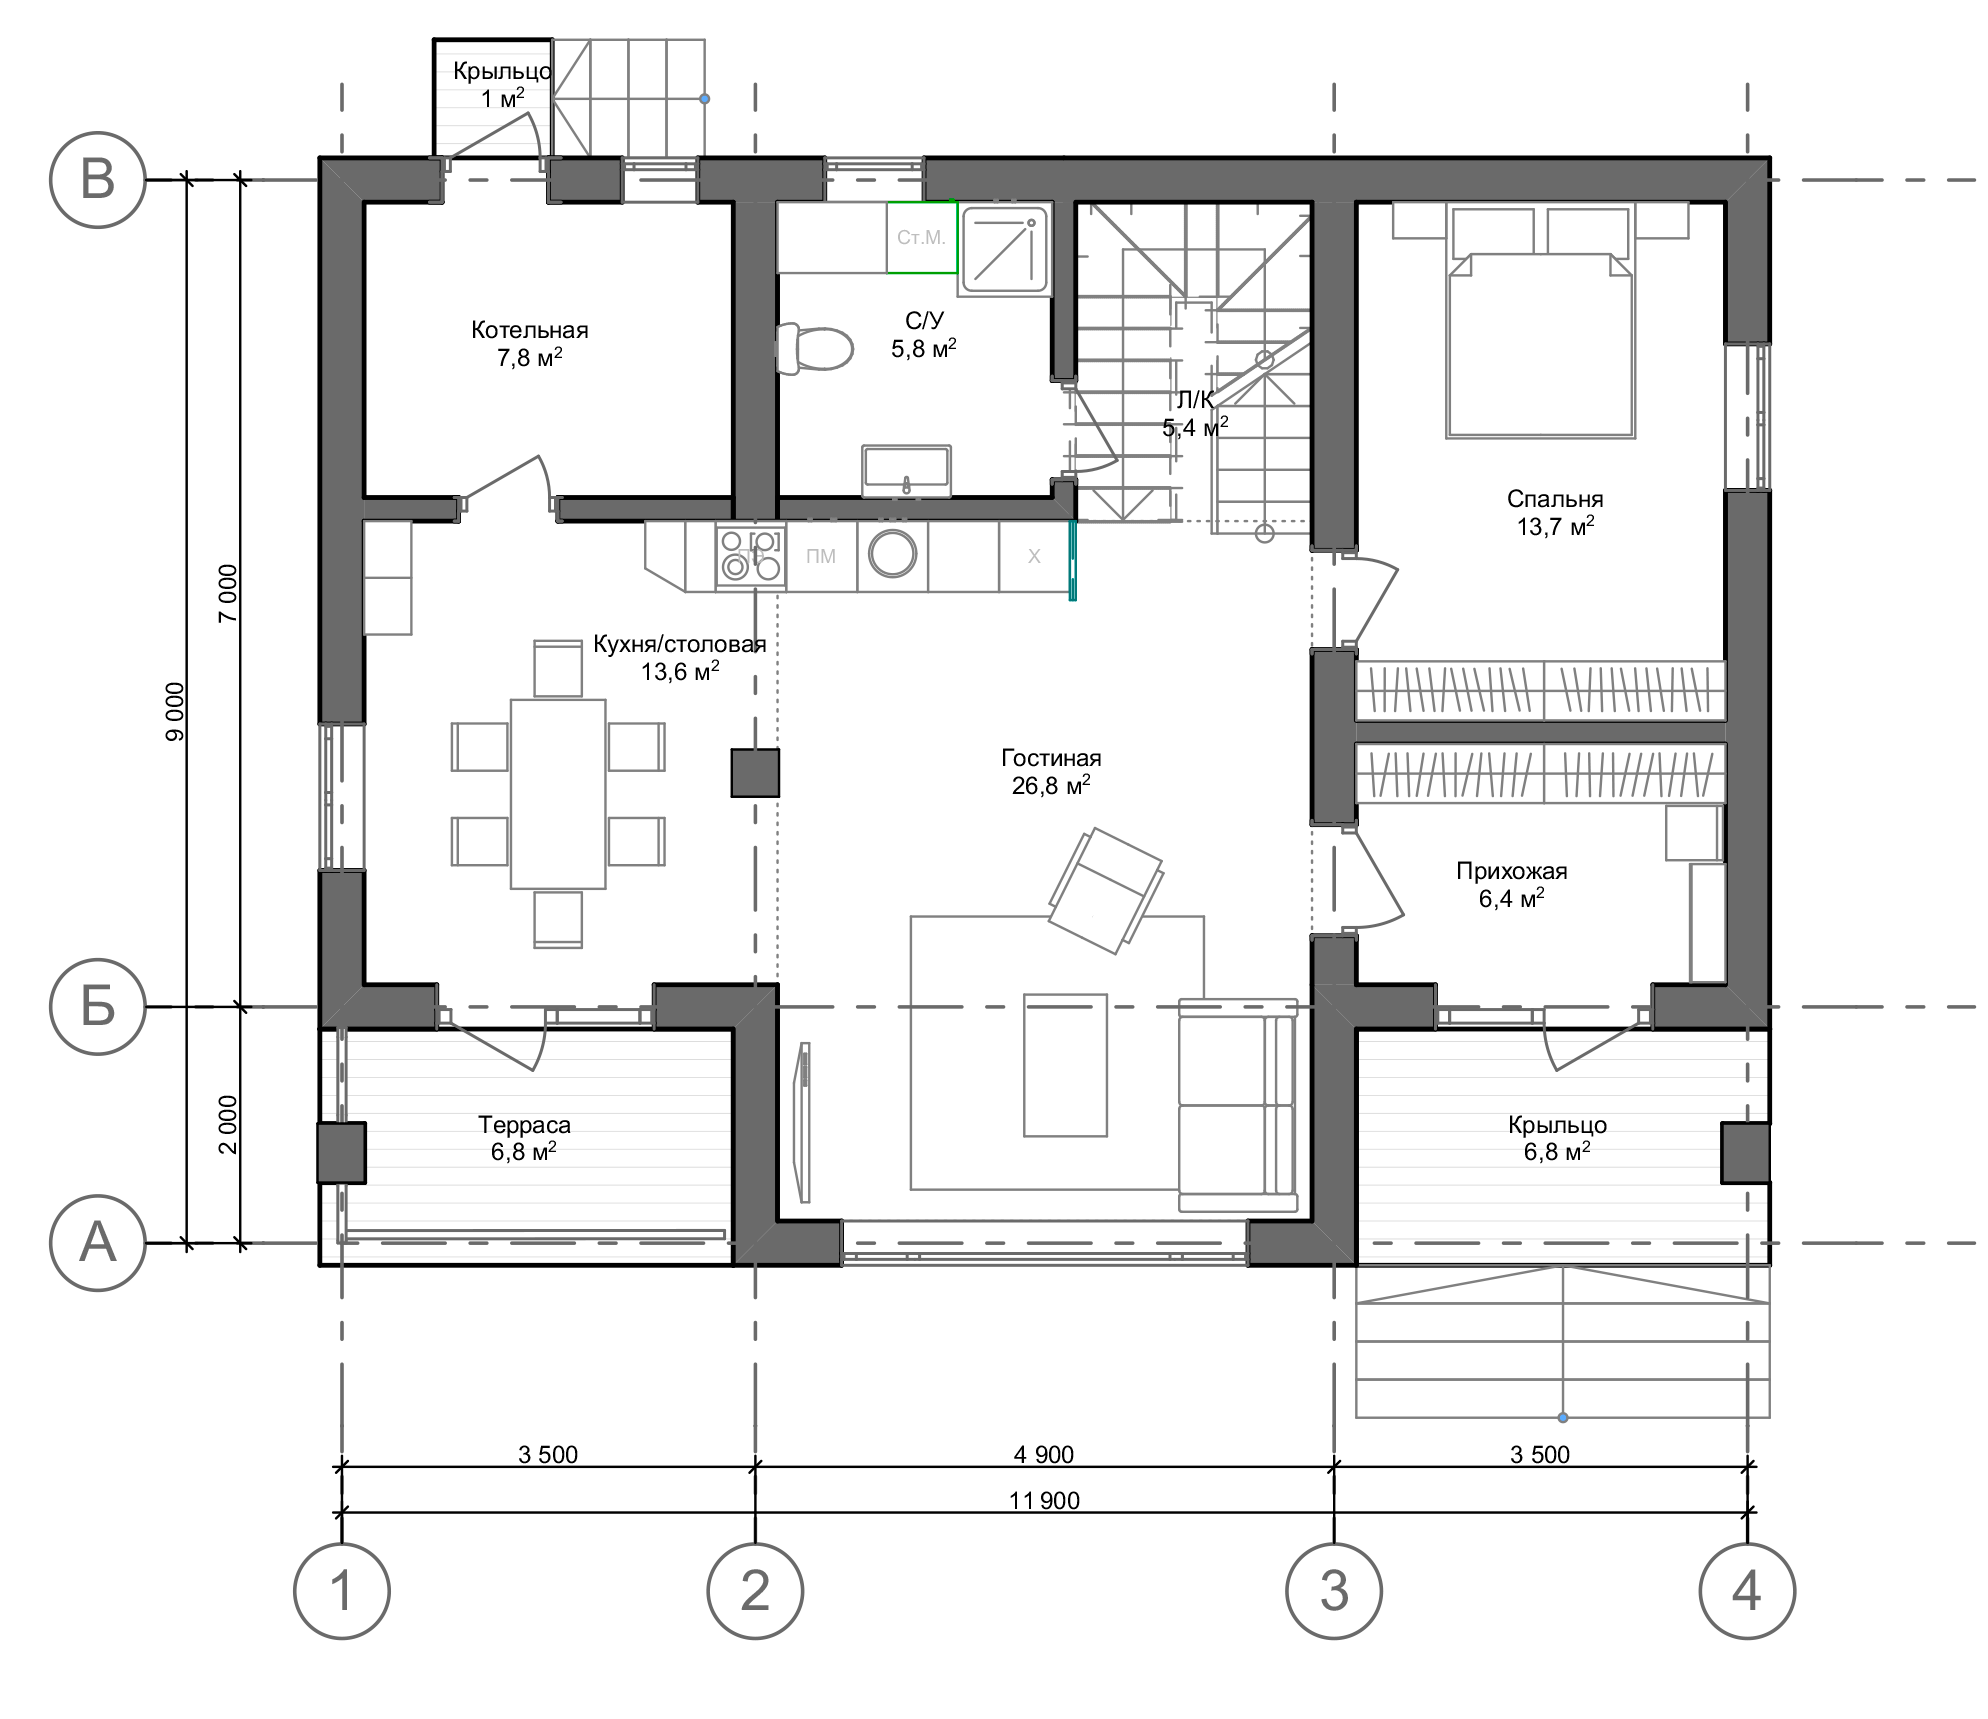 План первого этажа Hannover 2.0  (Дом Ганновер)